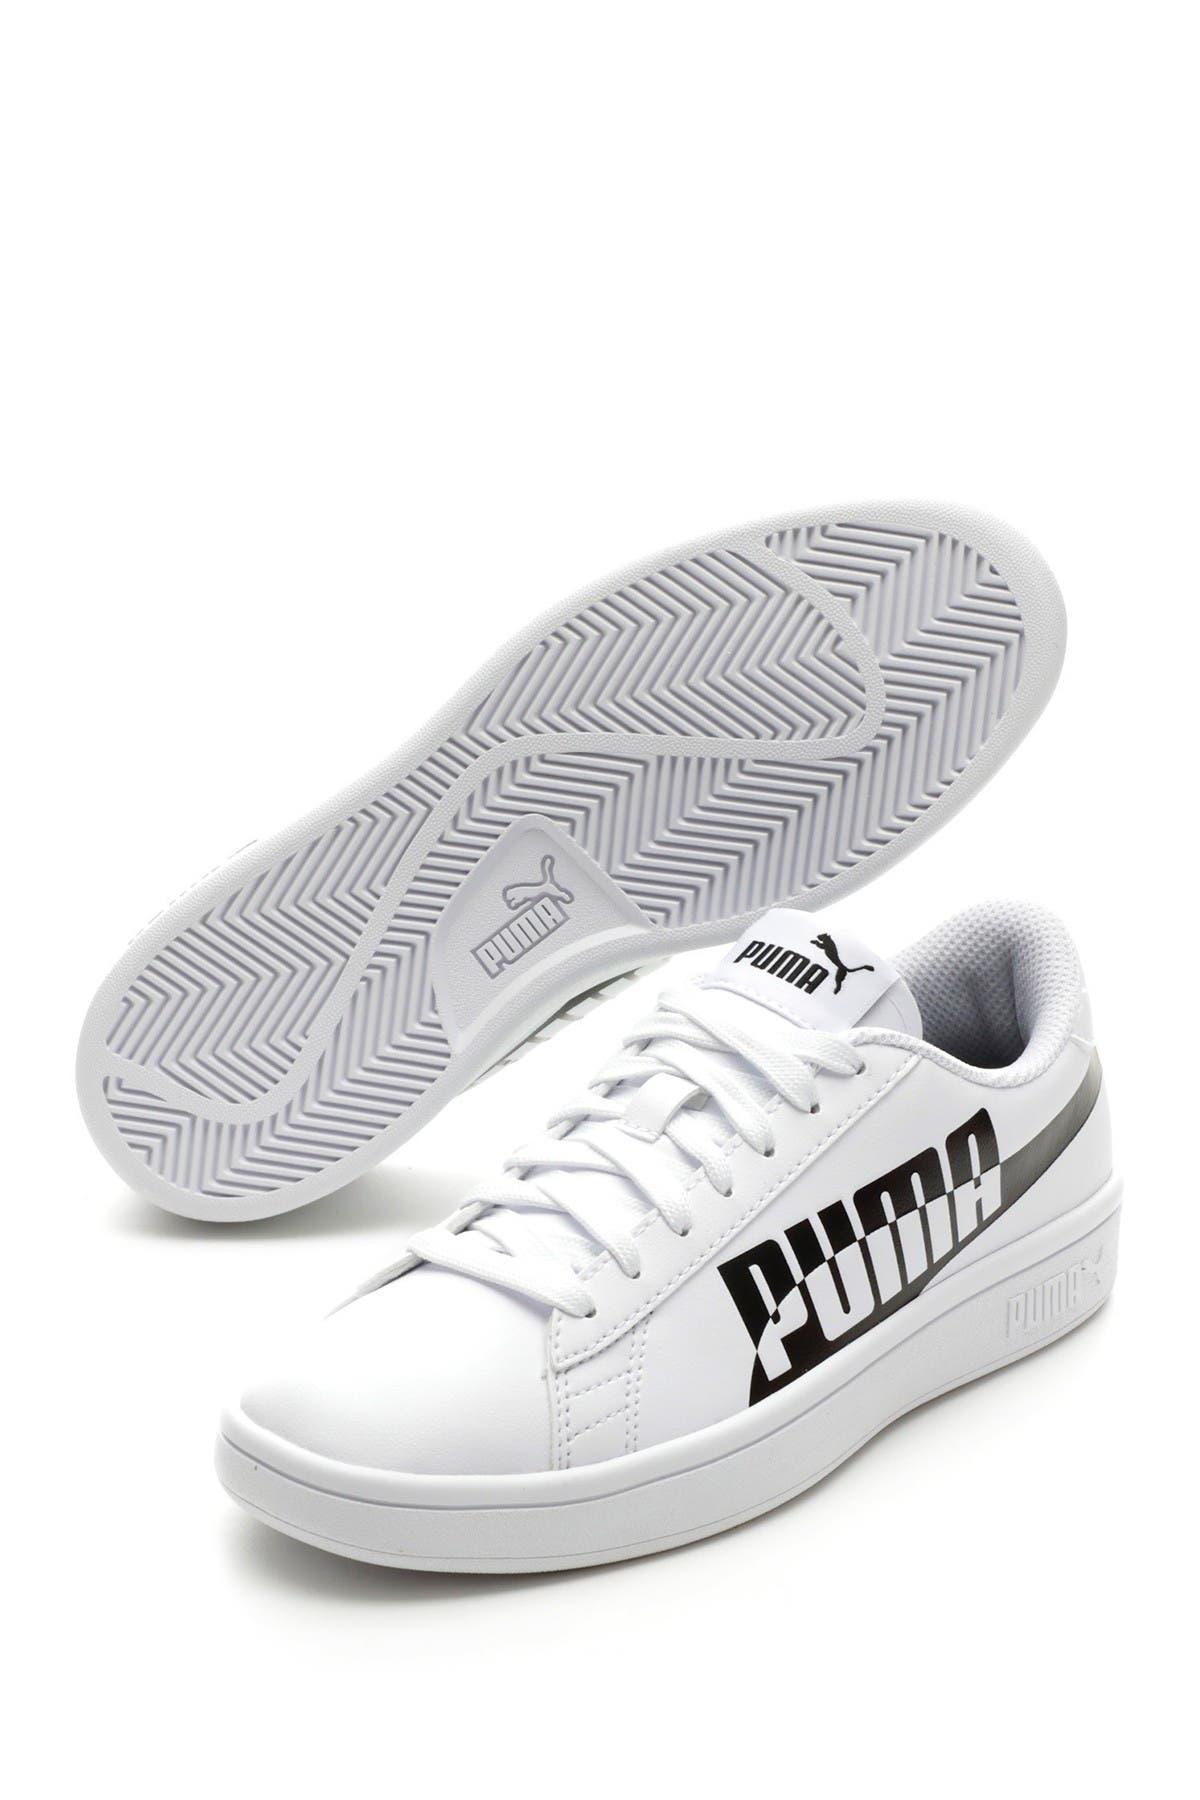 Image of PUMA Smash V2 Max Sneaker